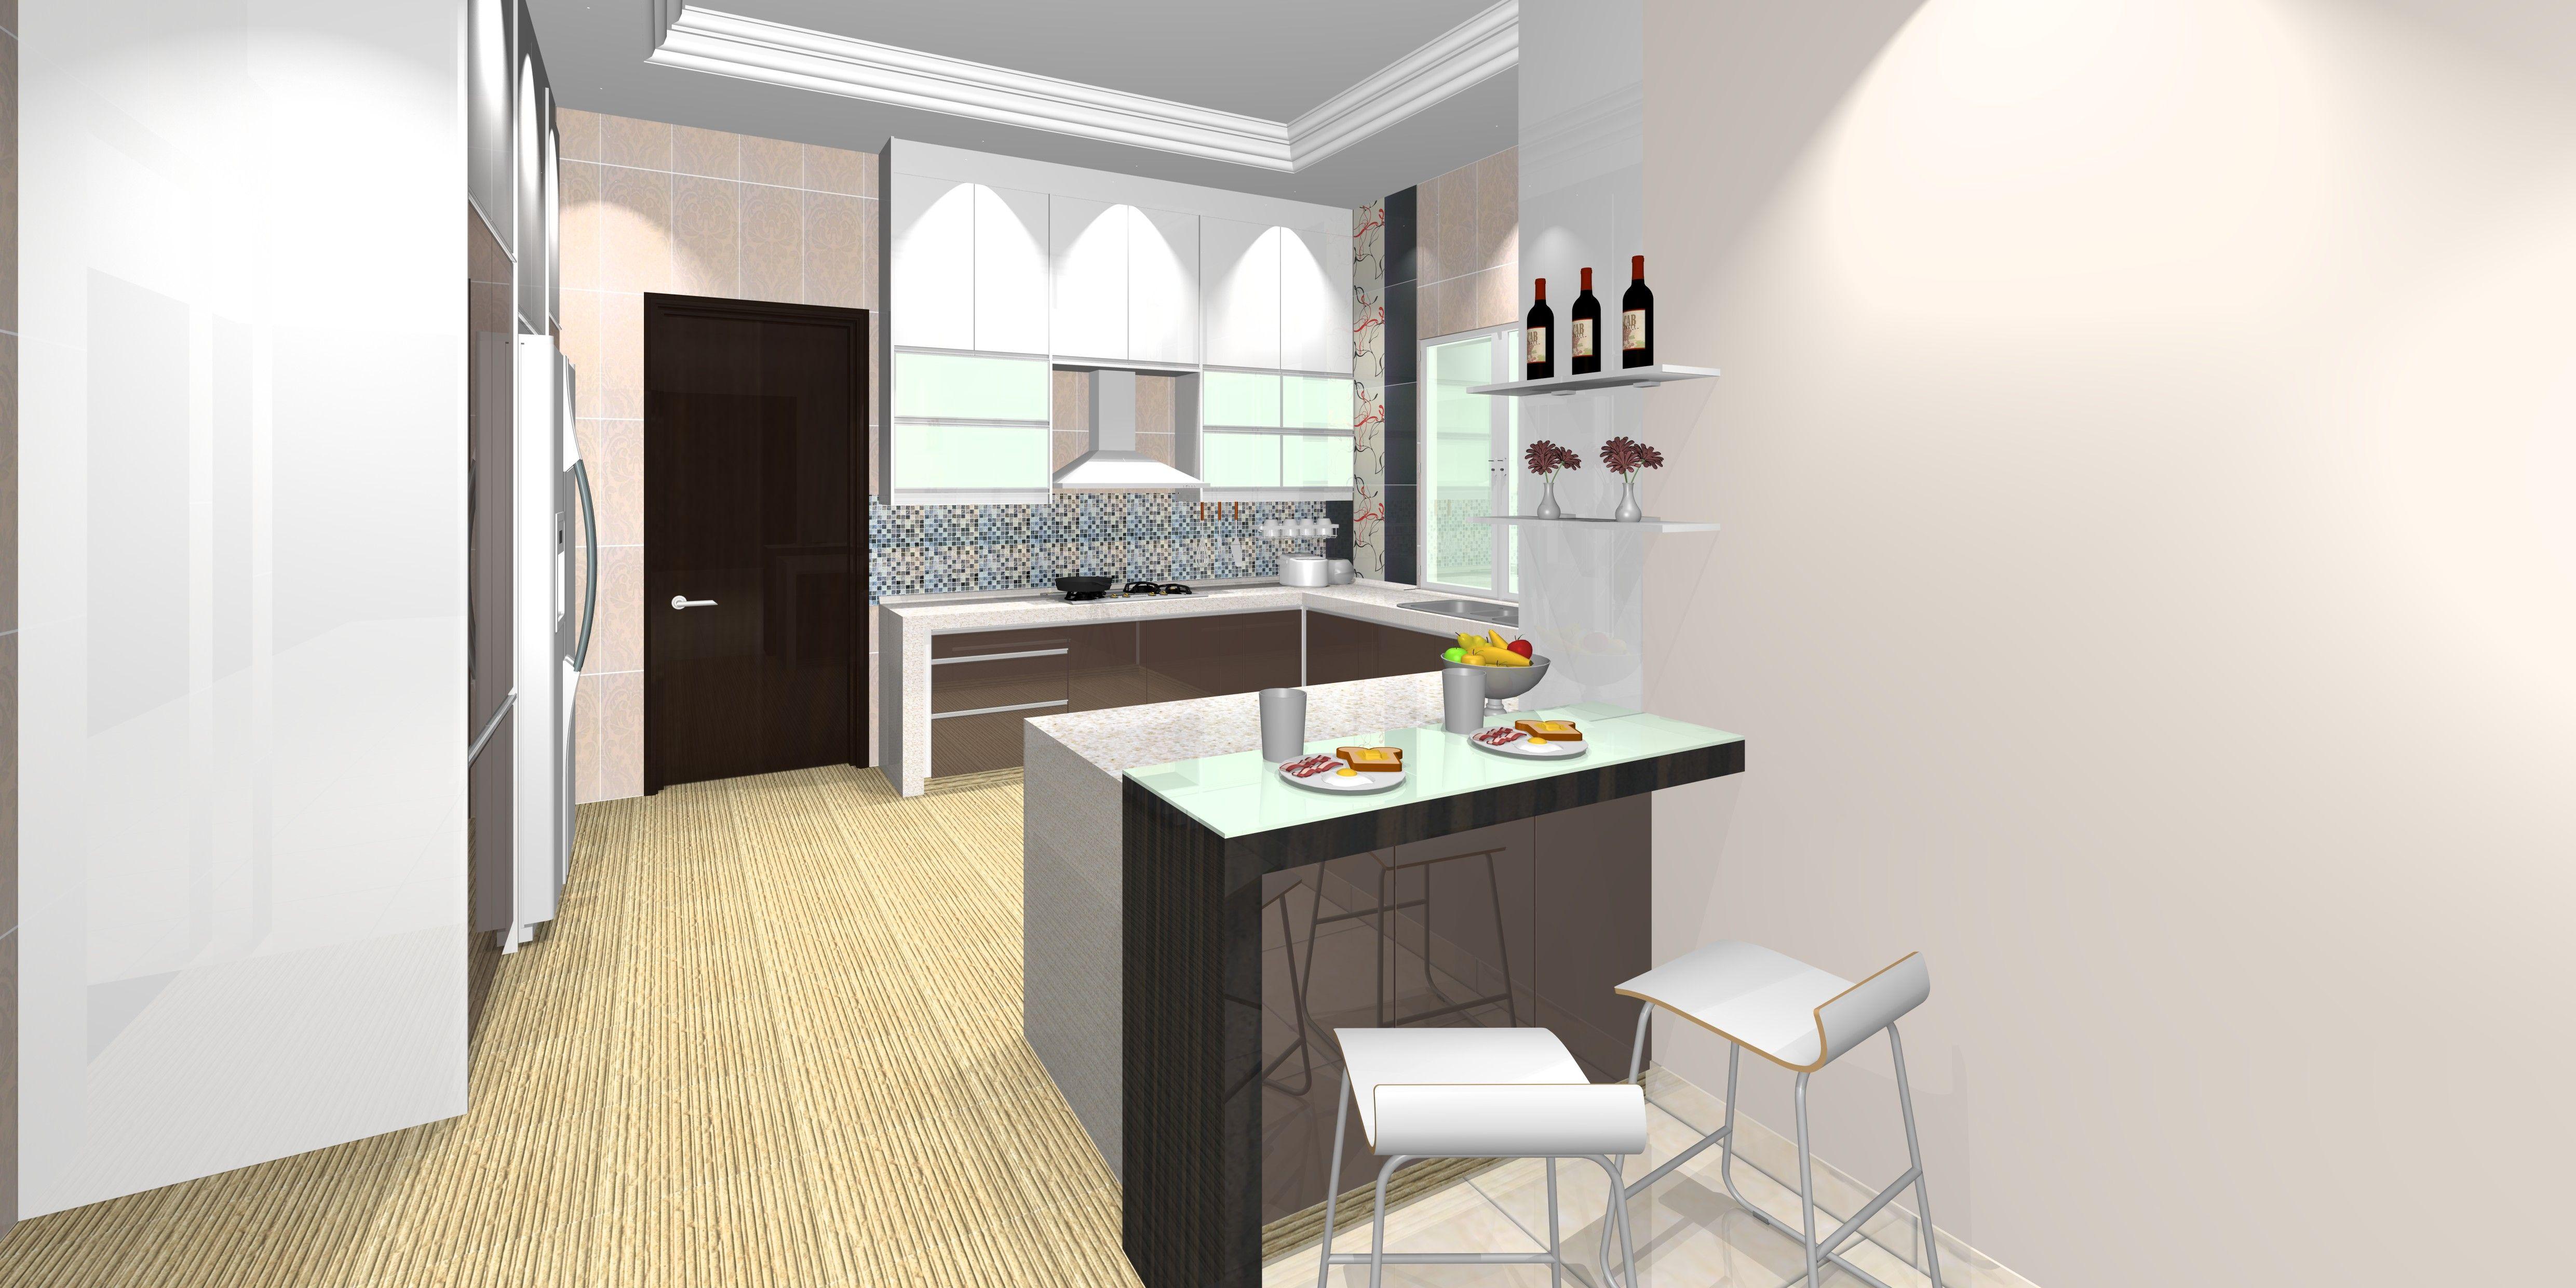 Pinthe Rustic Kitchens On Open Kitchens  Pinterest  Open Custom Wet Kitchen Design 2018